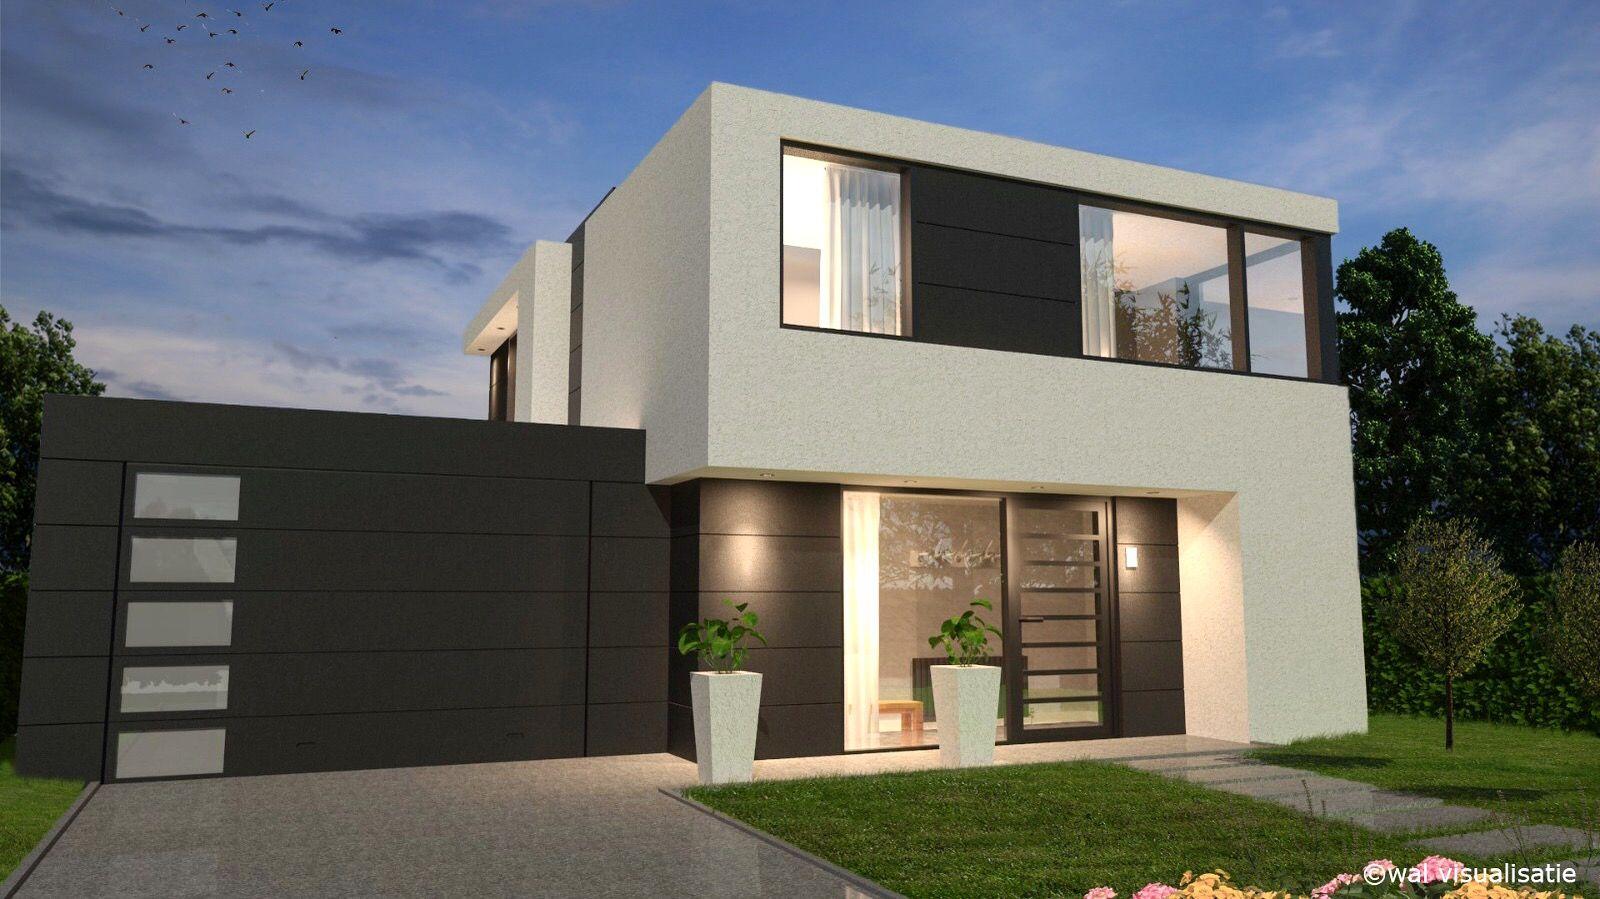 Visualisatie van een moderne woning. #architectuur #visualization